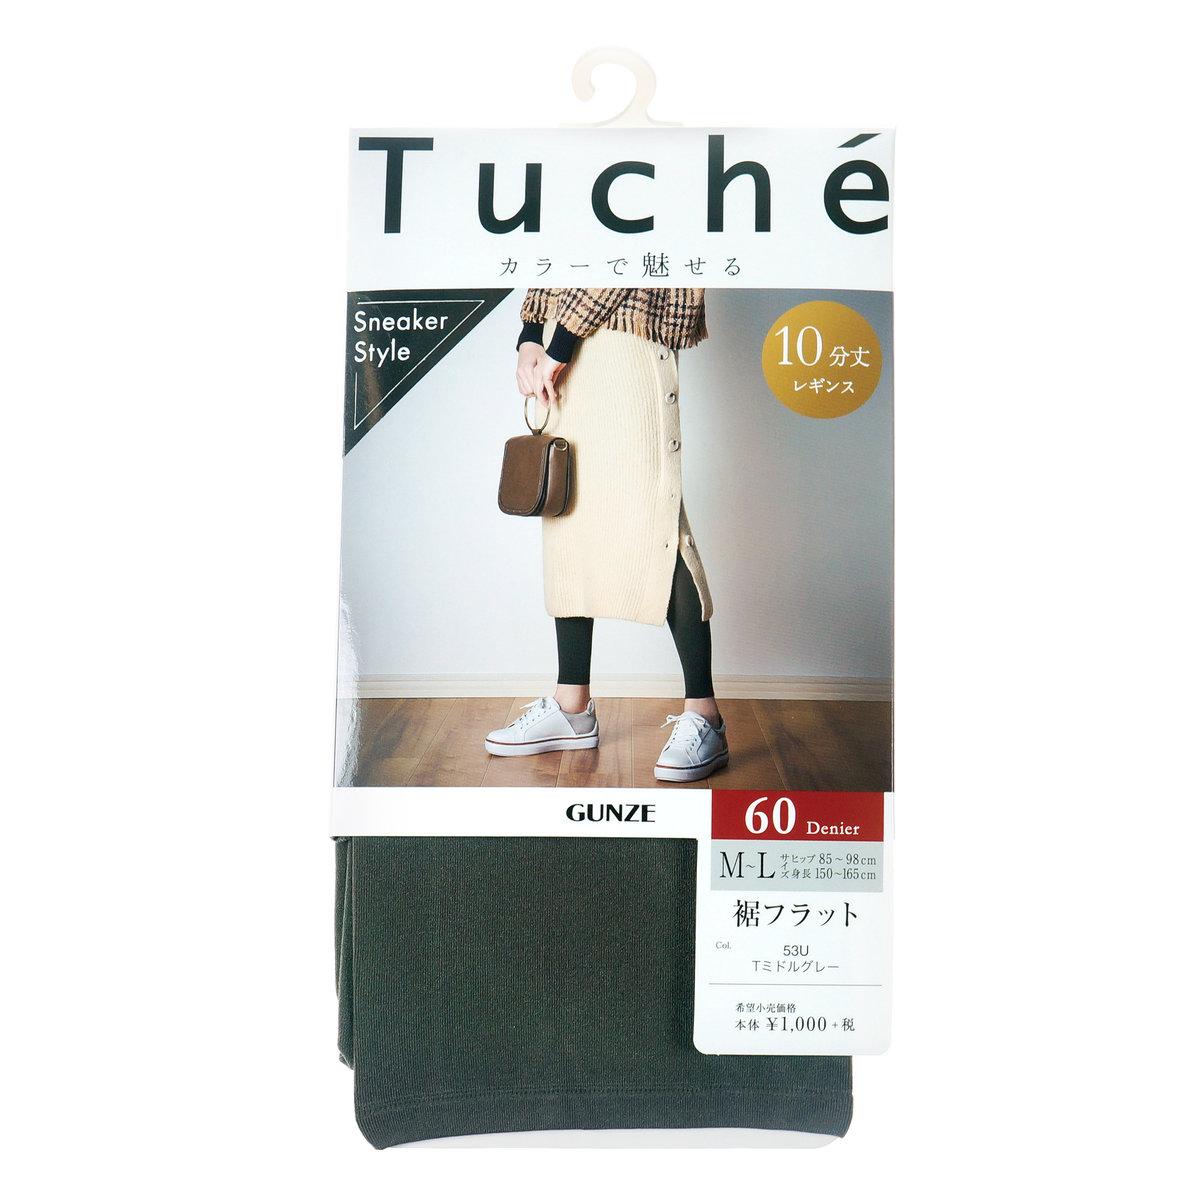 TUCHE THF21E Sneaker Style Ankle Leggings, Color: 53U Middle Grey, Size: M-L (4967162865204)